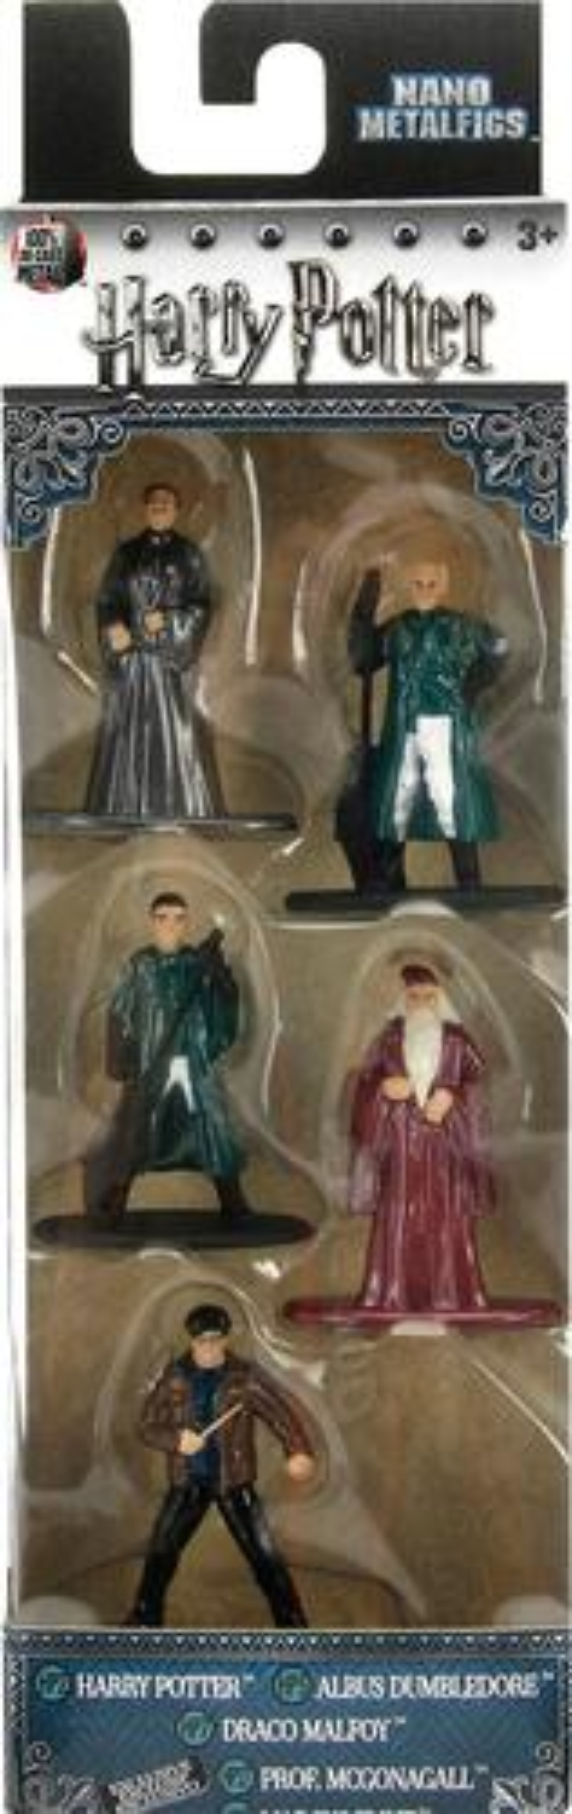 "Nano Metalfigs - Harry Potter 1.5"" Diecast Figure (5-Pack) 5975306"